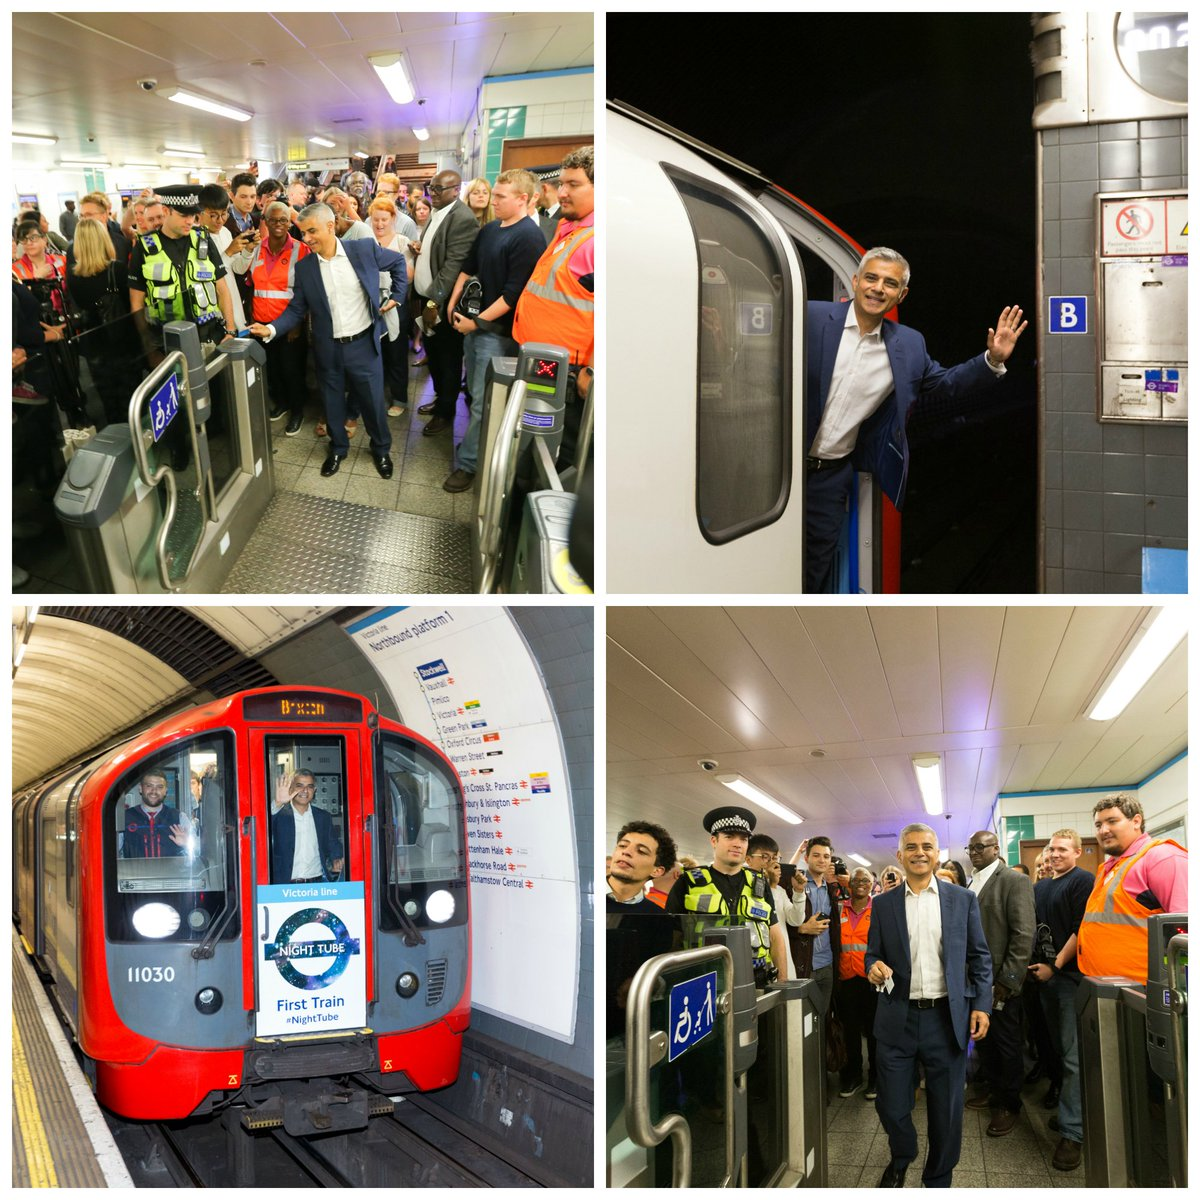 Cqyq6REWcAAbR3q - The Victoria Line's really big 50th birthday! #2